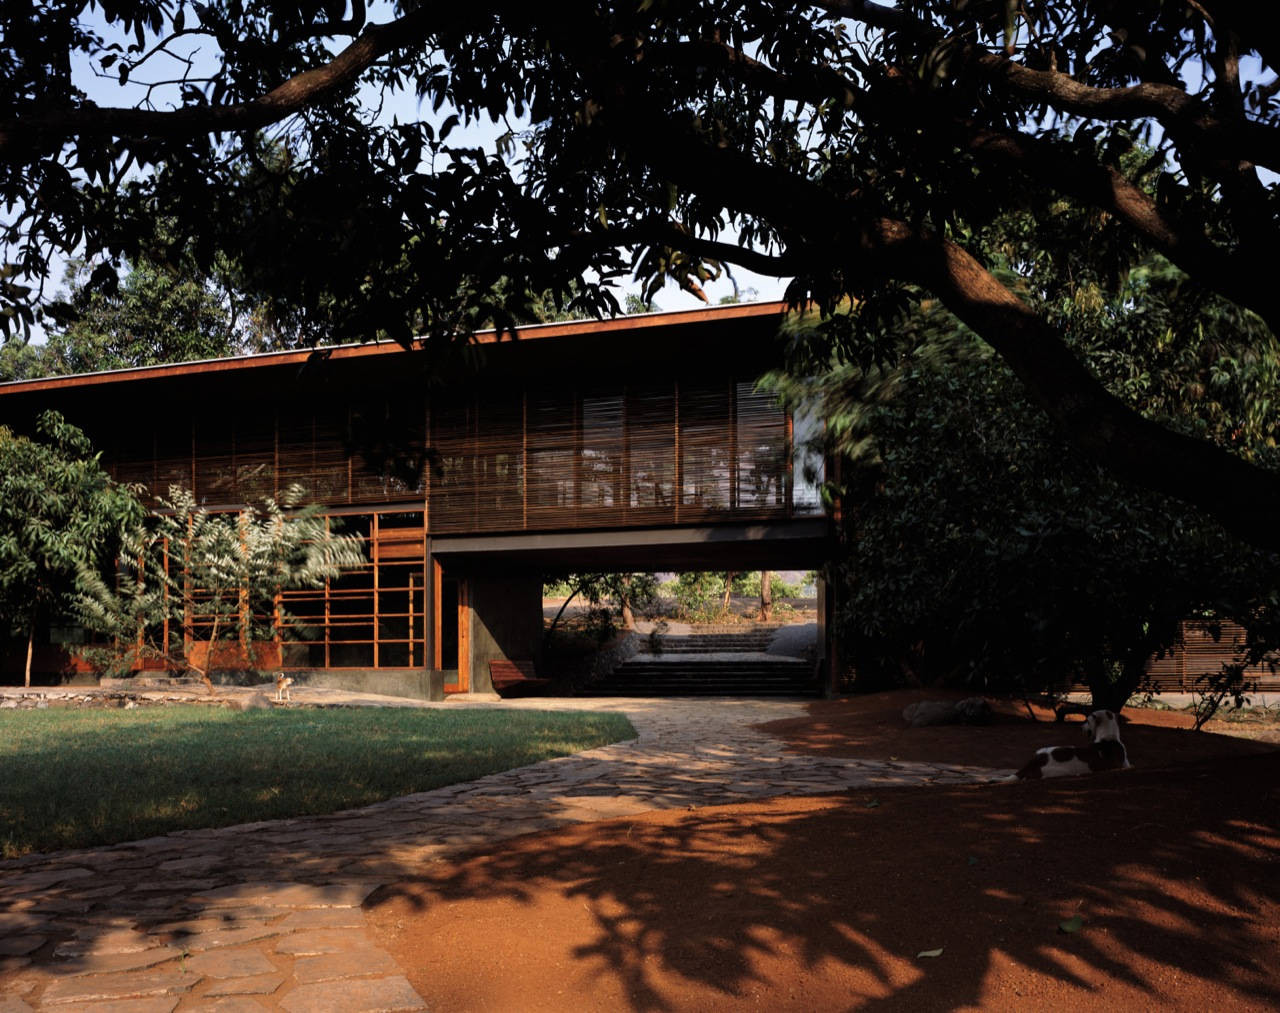 Belavali House / Studio Mumbai, © Helene Binet